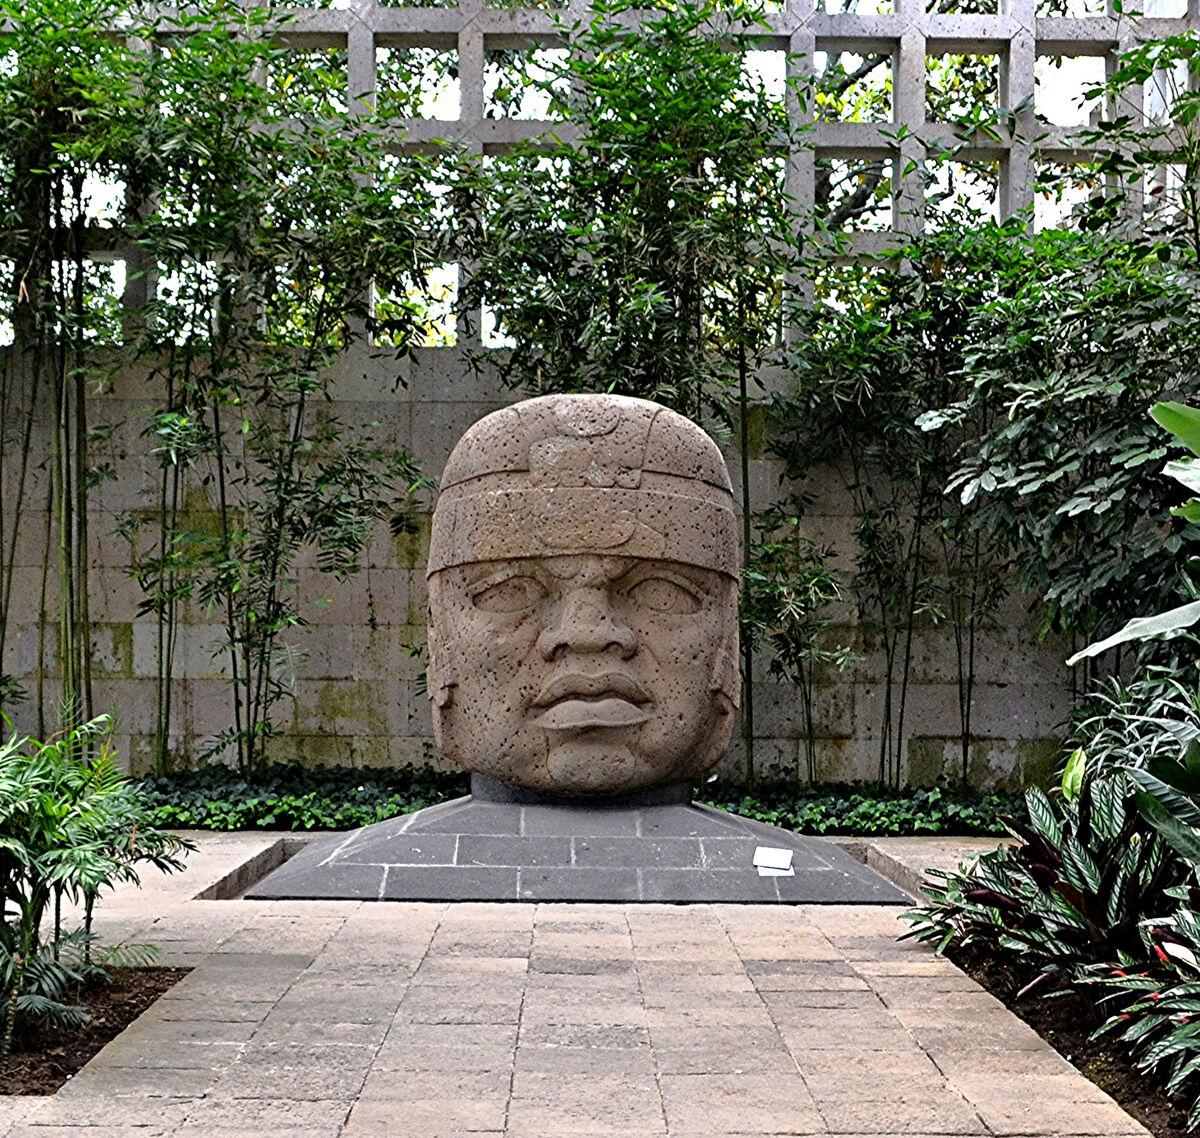 Olmec Head, San Lorenzo, No. 1, 1200-900 B.C.E. Photo via Wikimedia Commons.